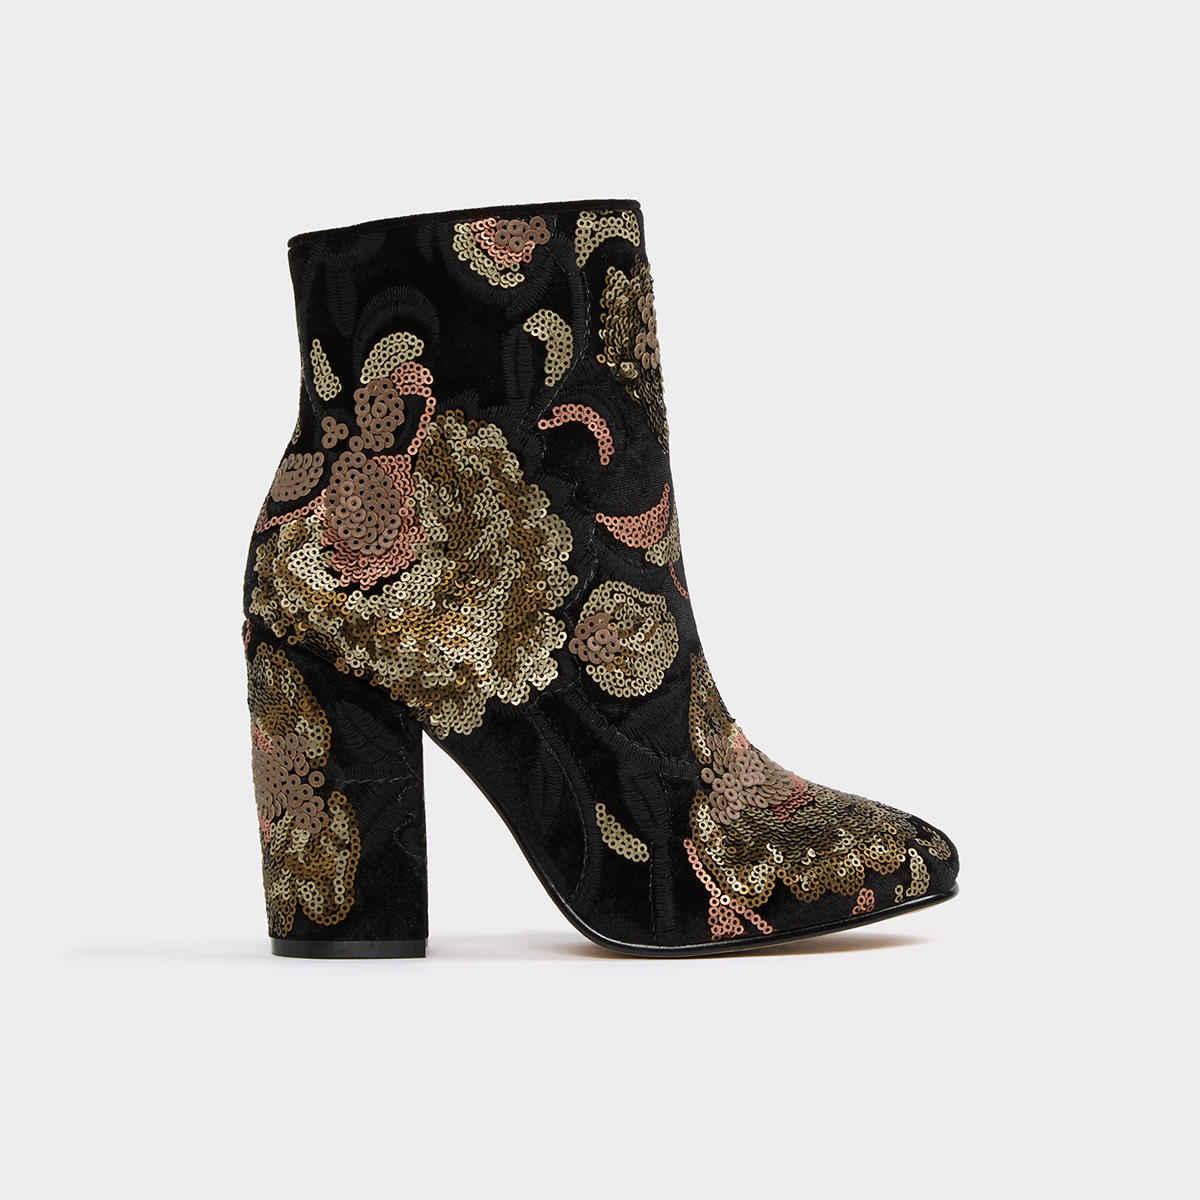 7030bf843 أحدث الأحذية طويلة الرقبة للنساء ماركة Aldo | المرسال